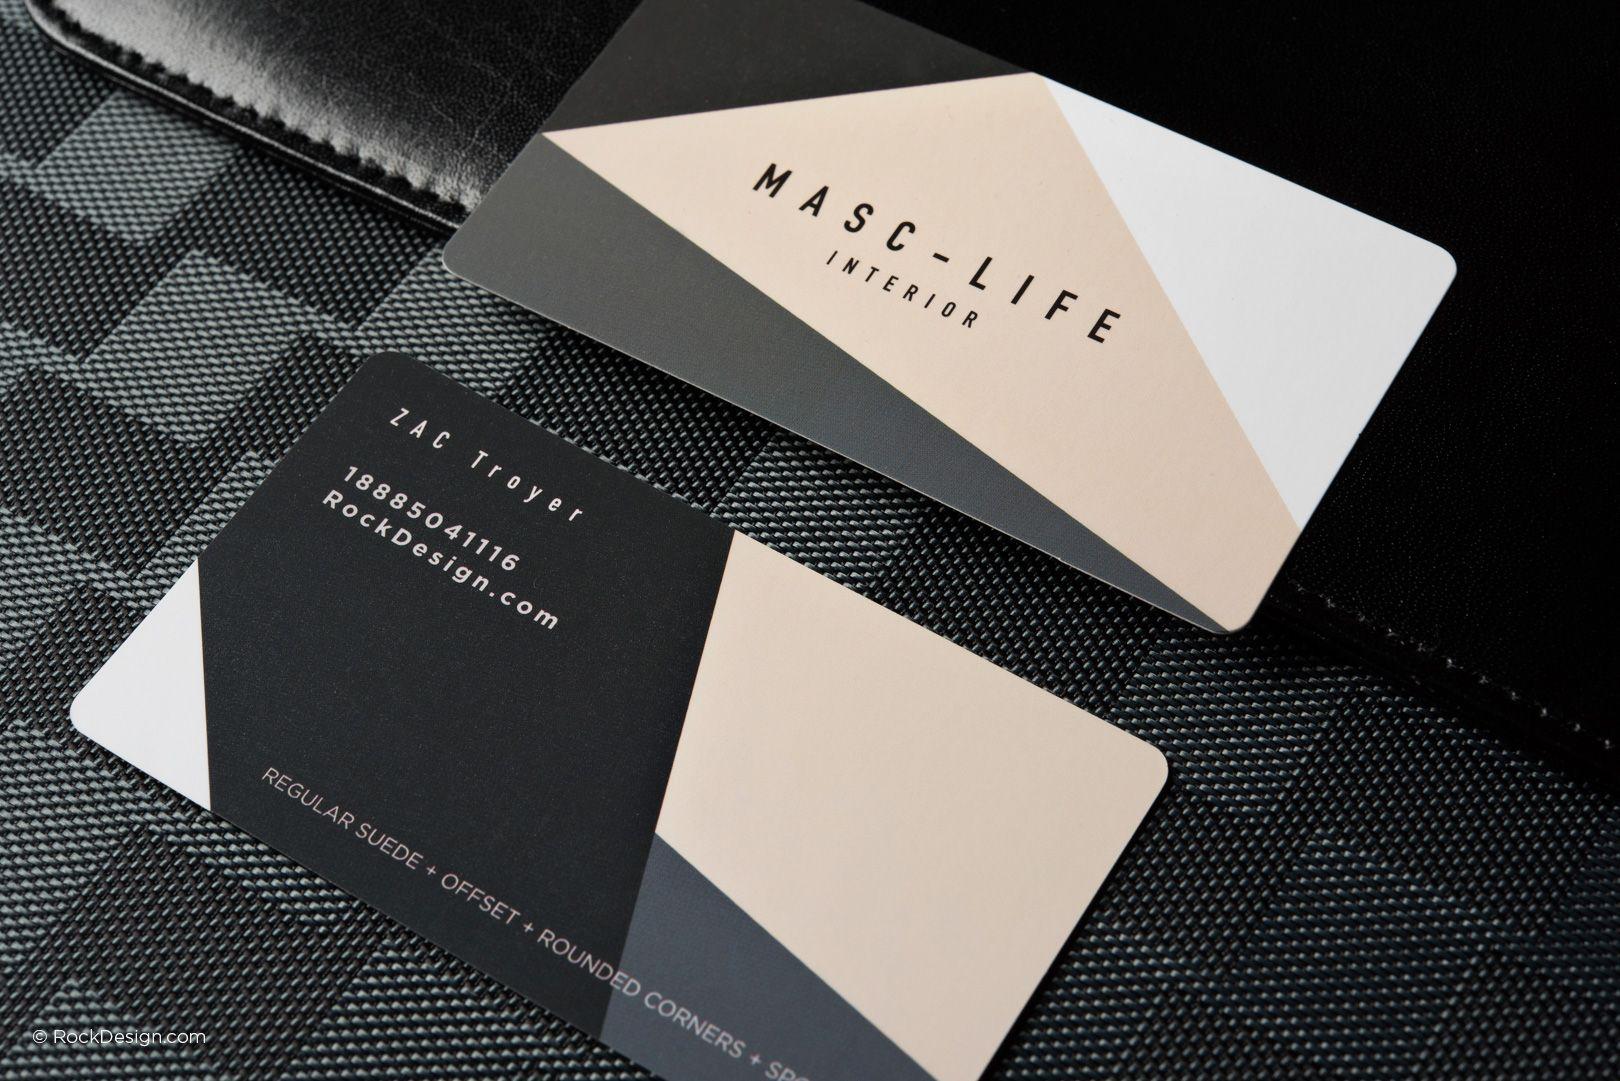 Modern elegant regular suede business card template with spot uv modern elegant regular suede business card template with spot uv masclife rockdesign luxury business friedricerecipe Image collections